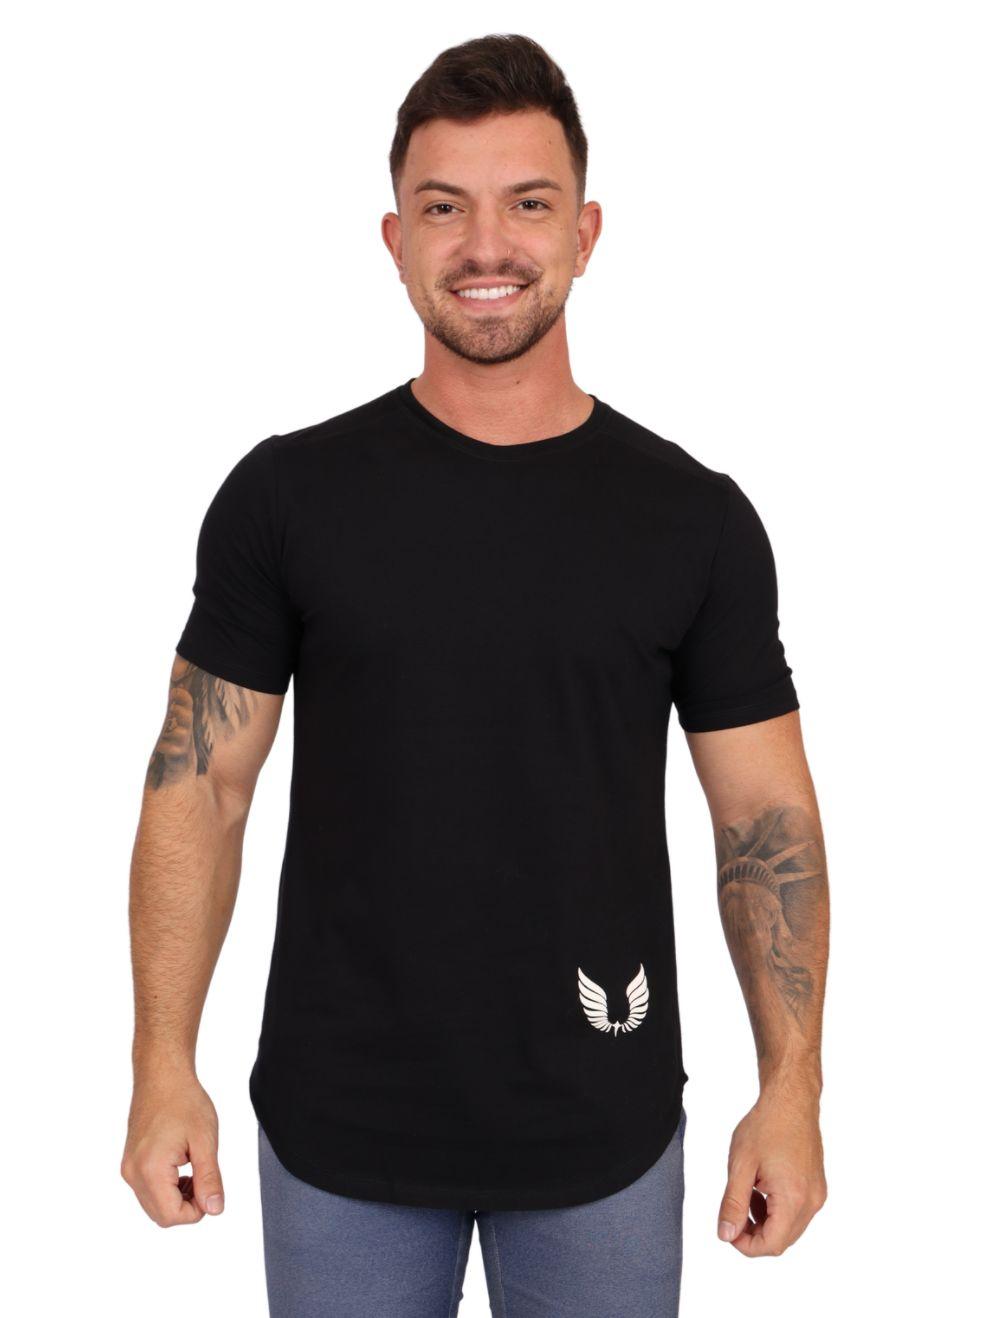 Camiseta Masculina Manga Curta Estampada Seven